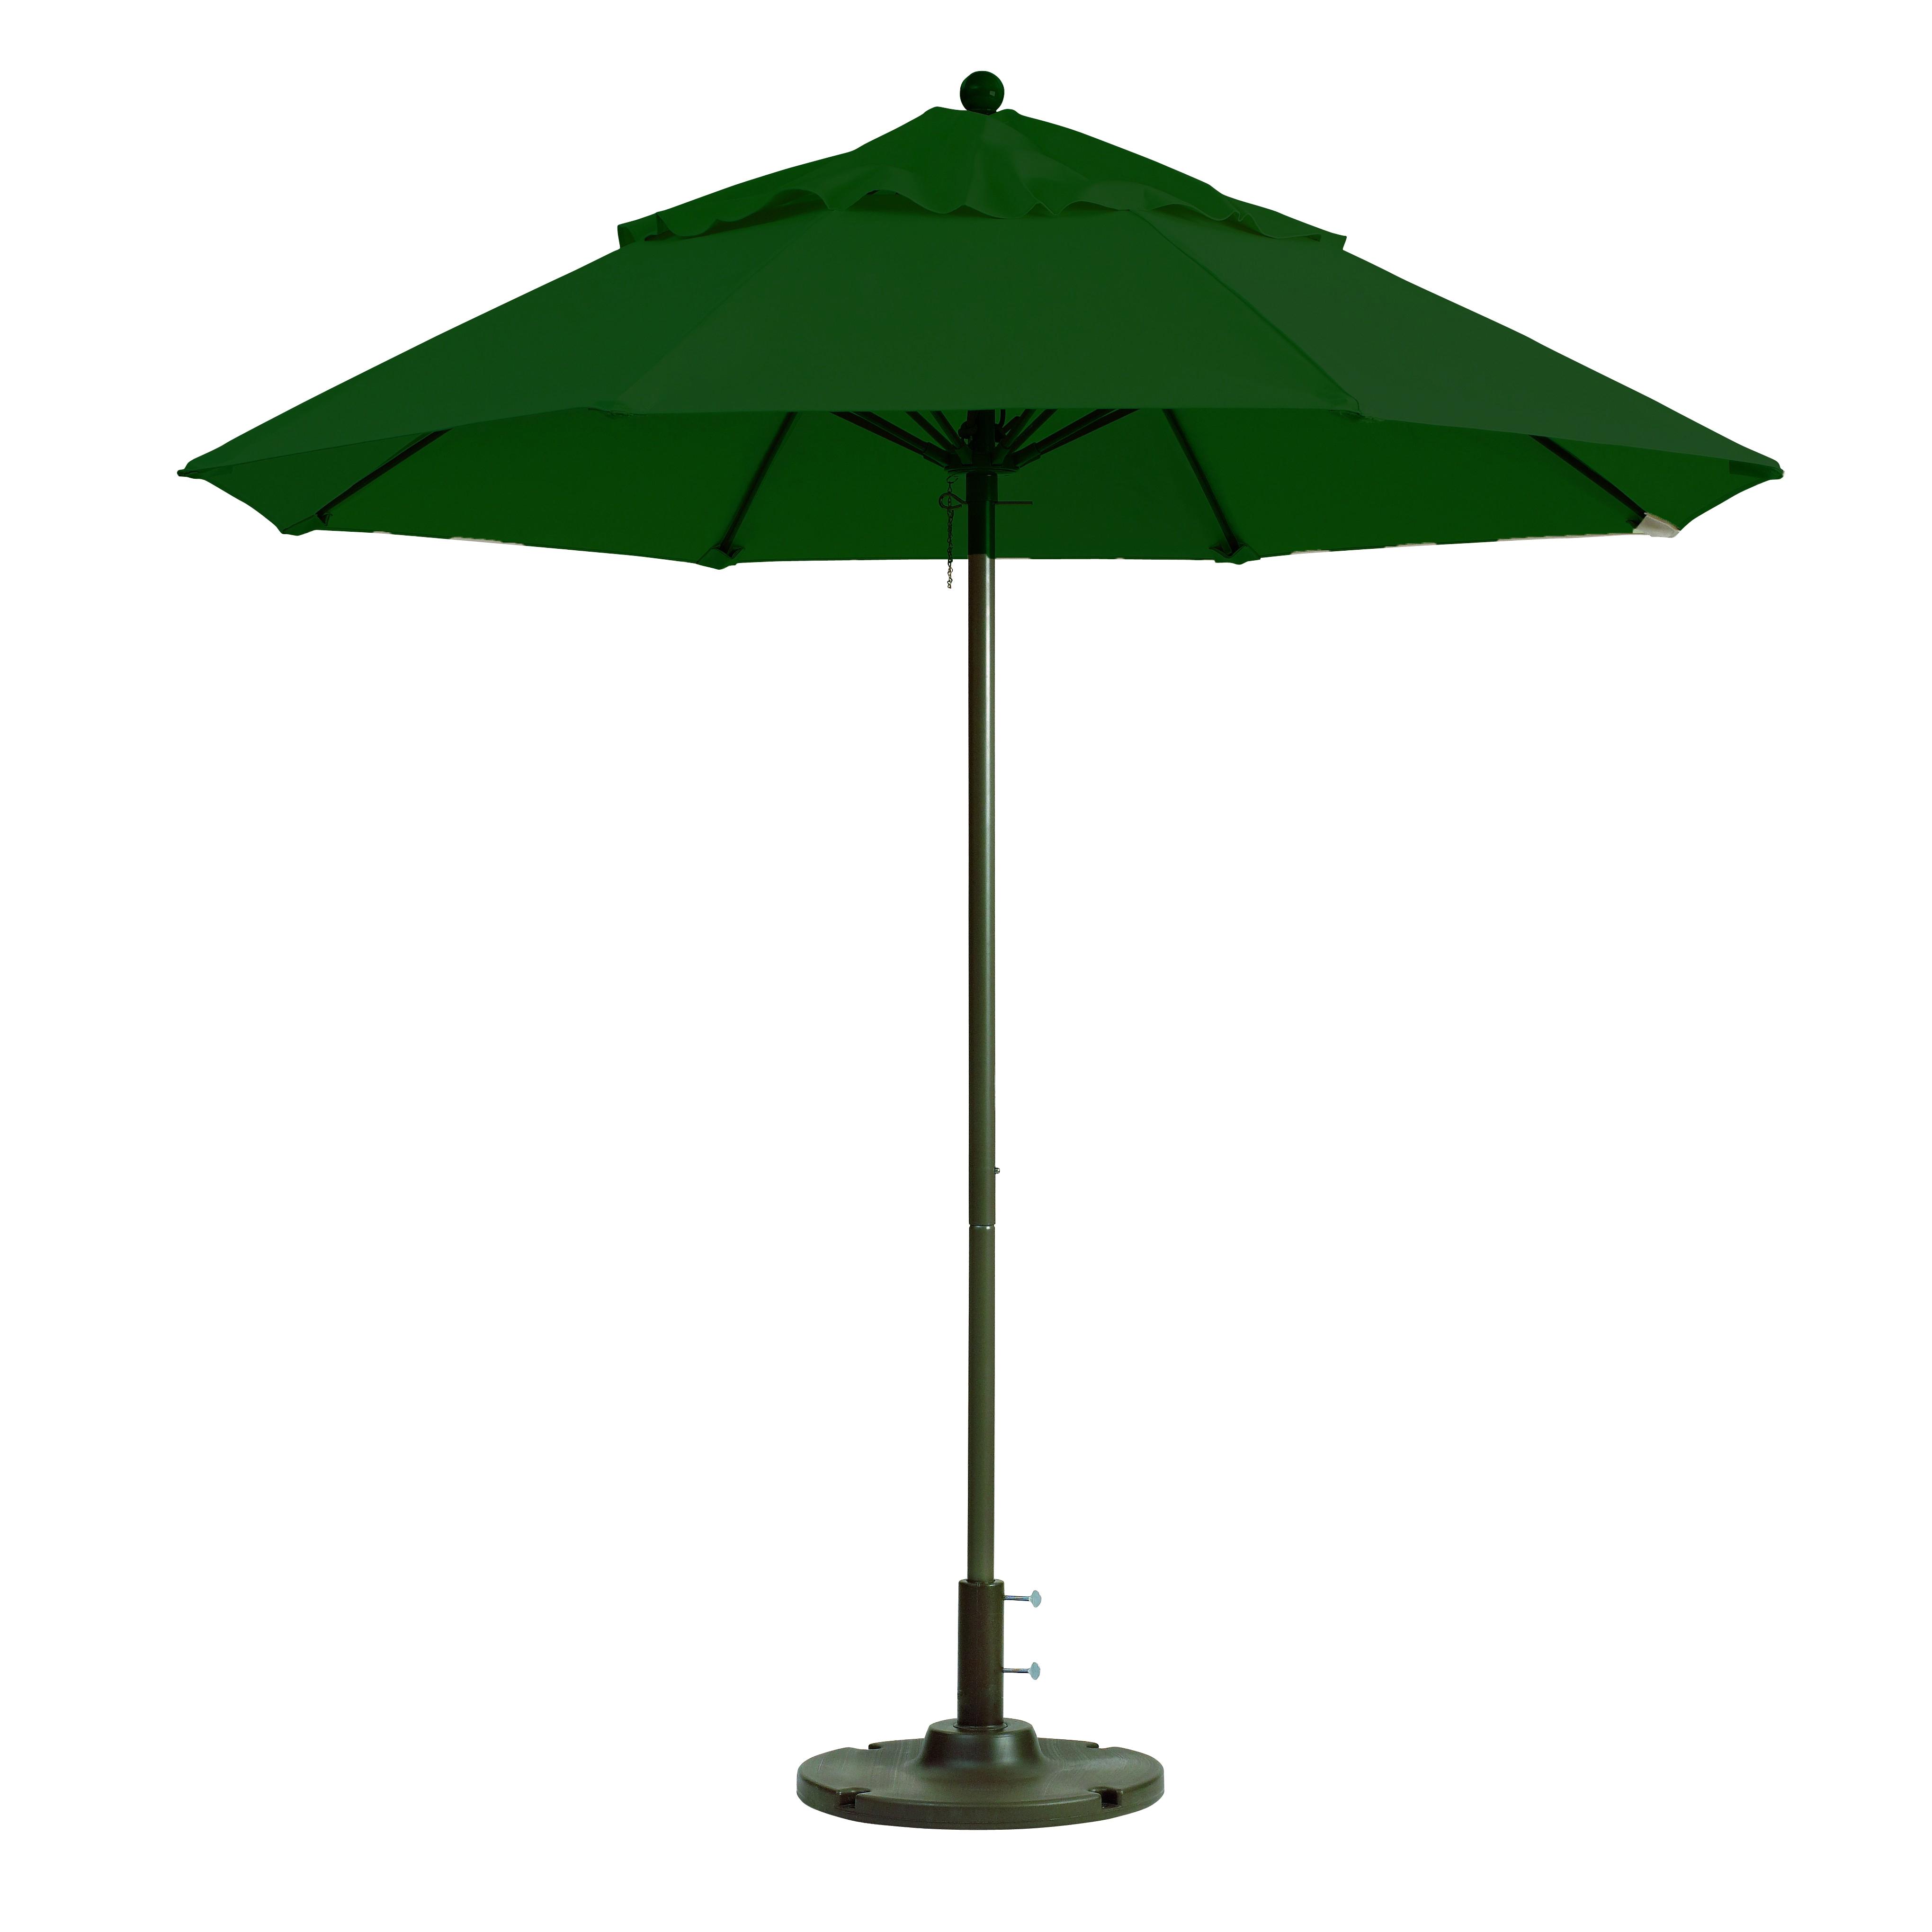 Grosfillex 98382031 umbrella